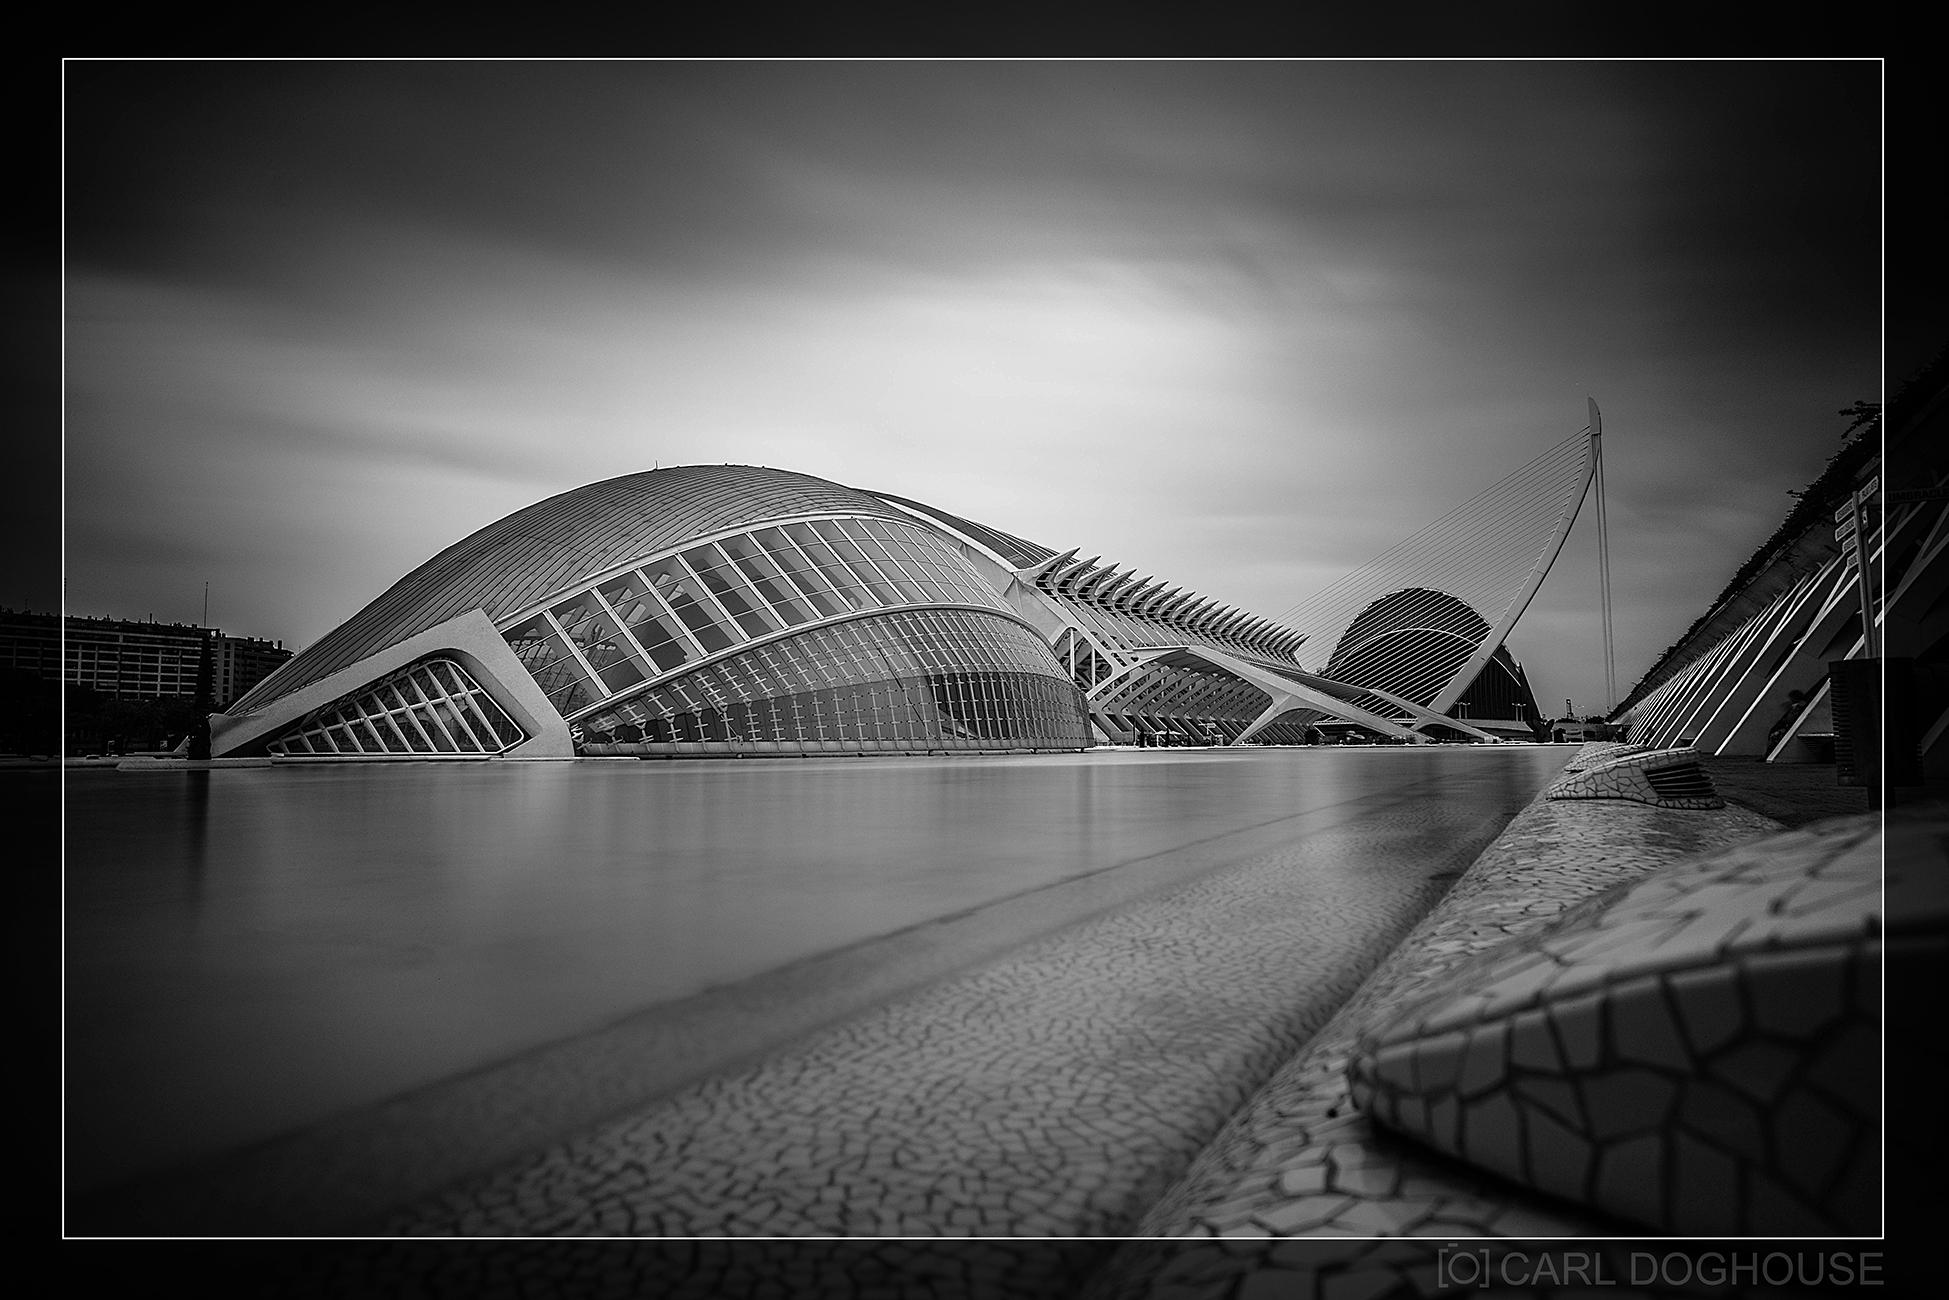 Arts and Science Centre, Valencia, Spain